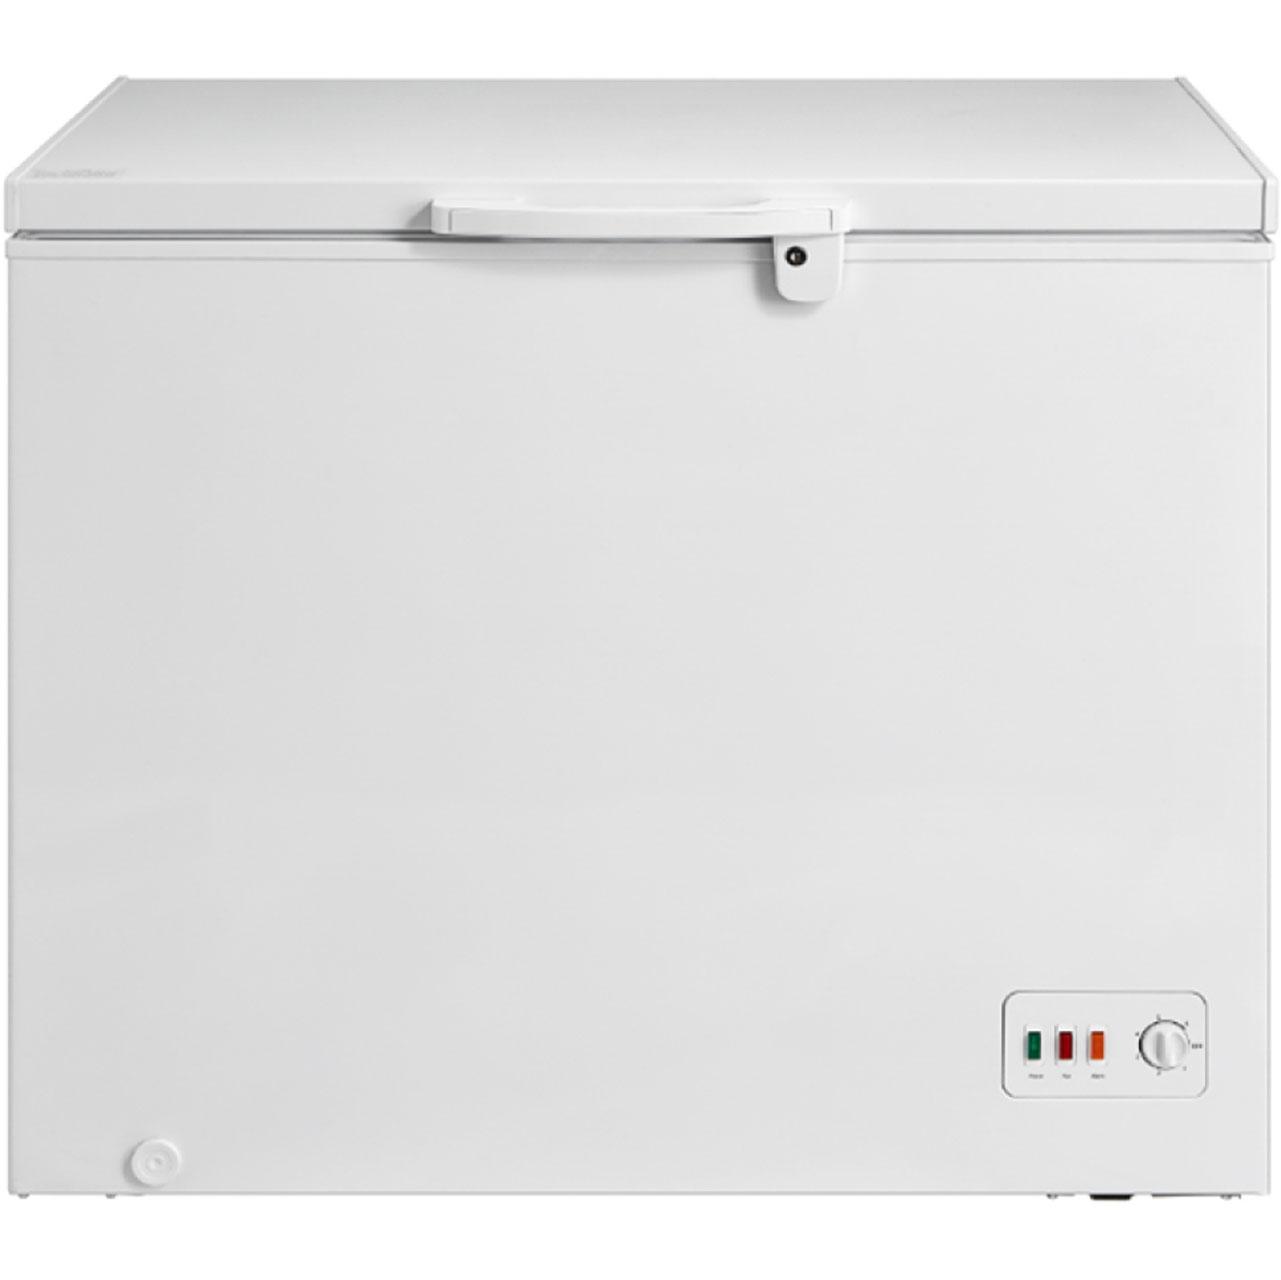 Daewoo, daewoo fridge freezer, fridge freezer, fridge, freezer, daewoo fridge, daewoo freezer